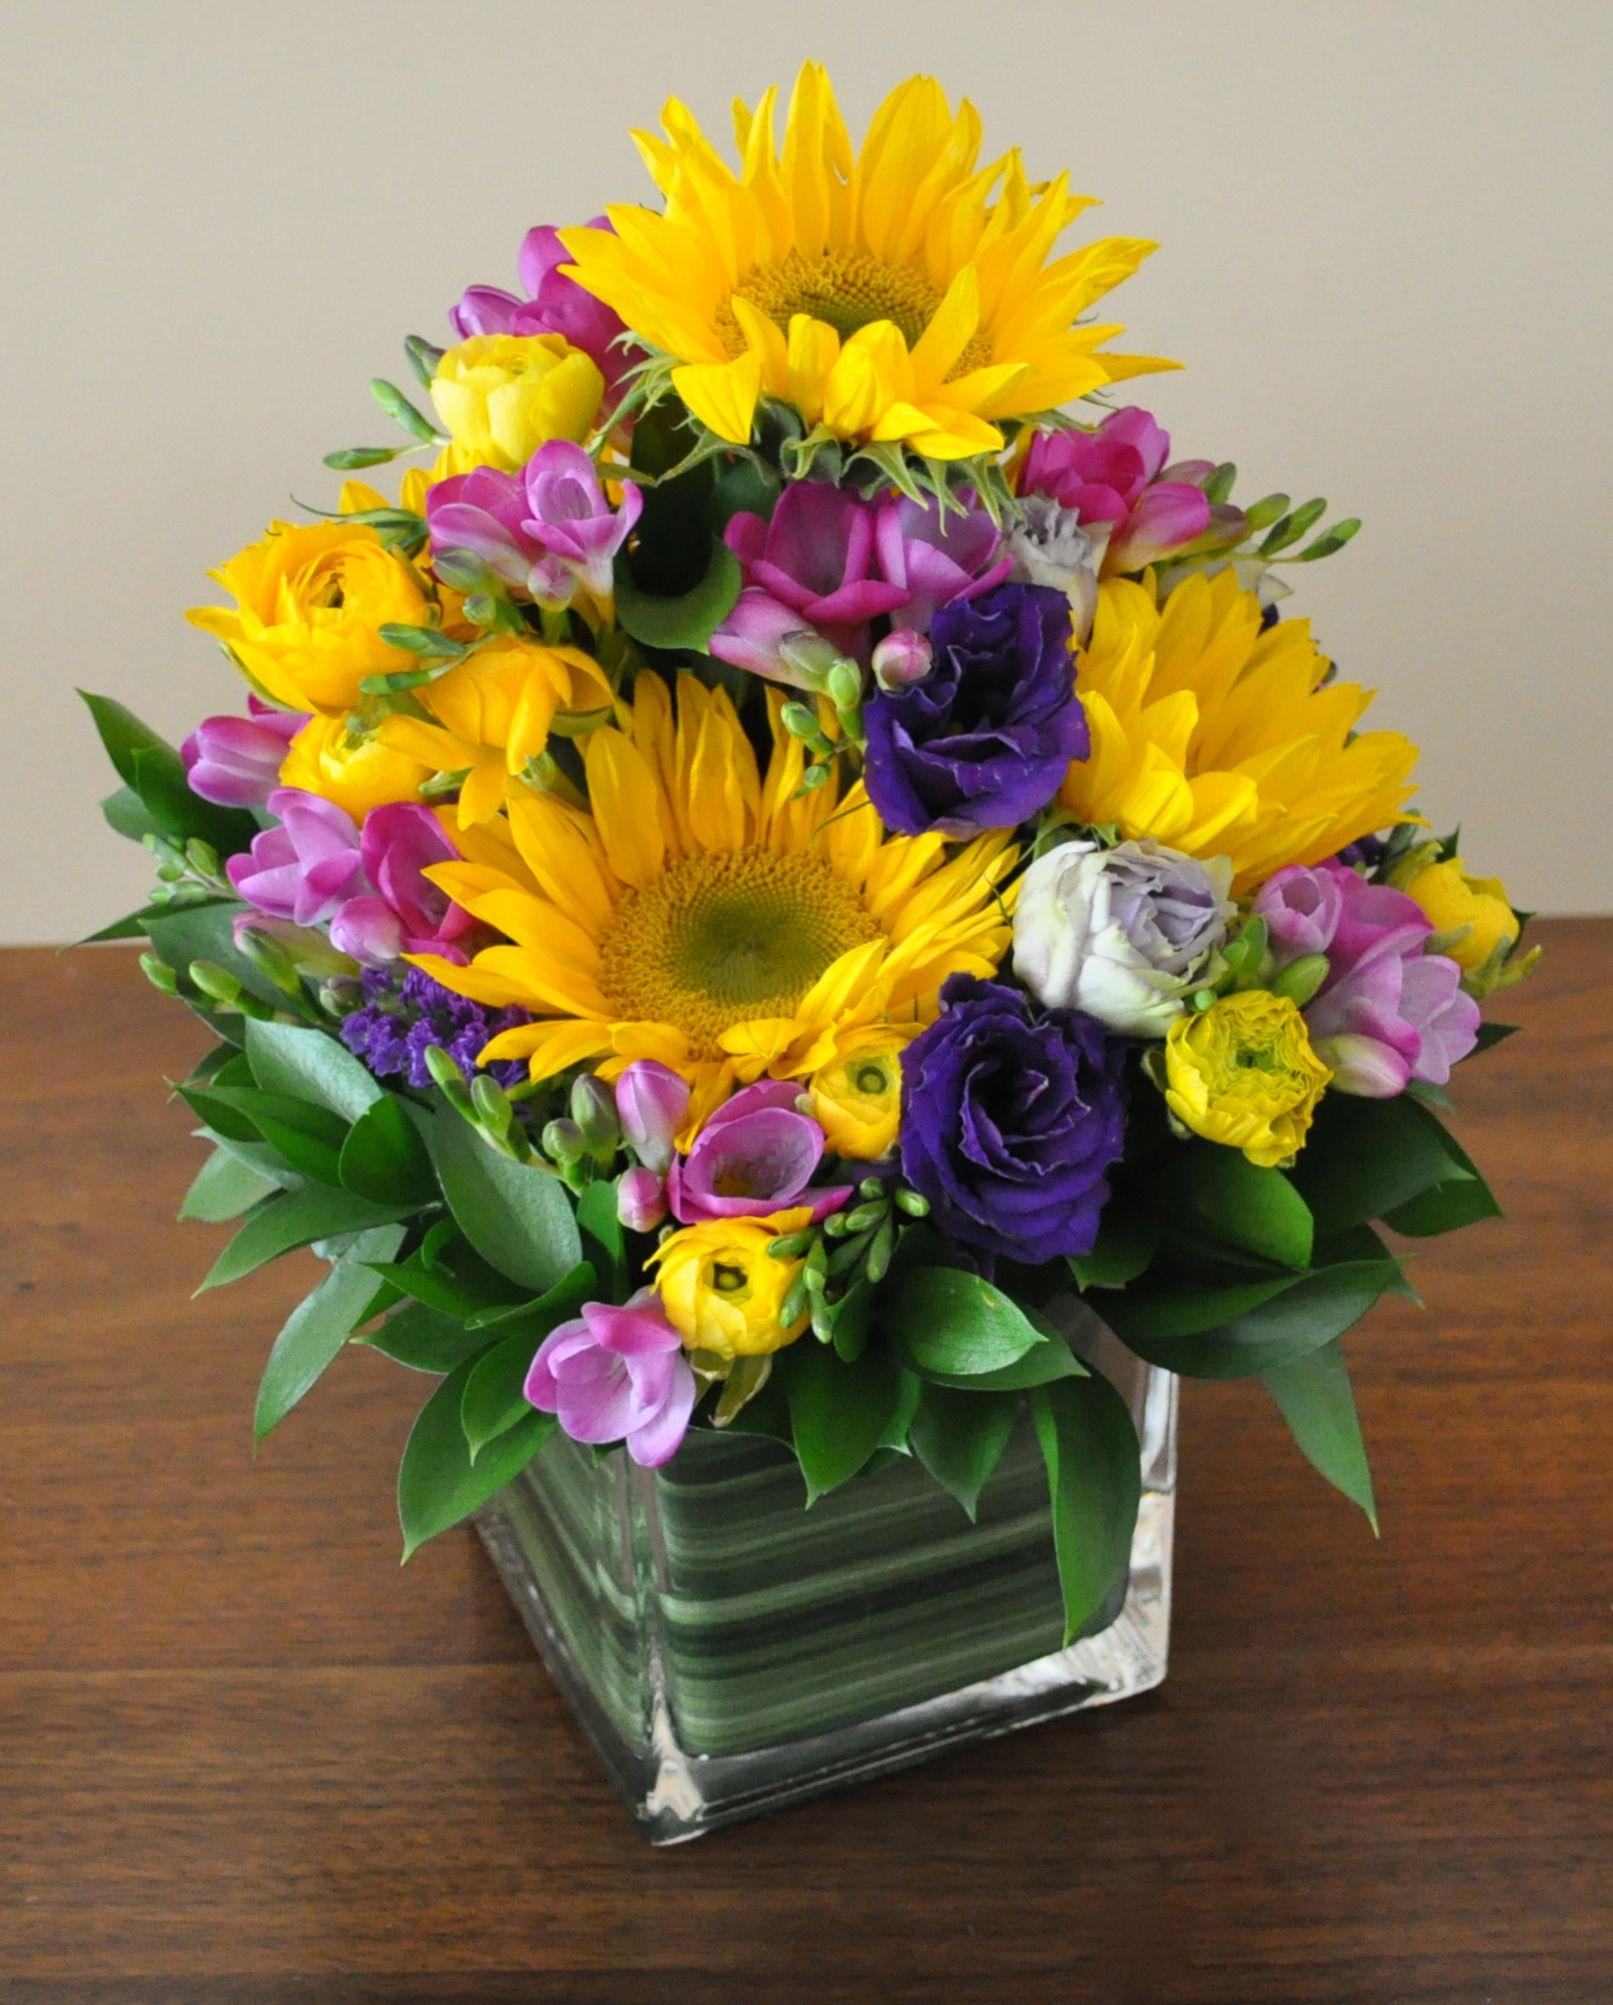 A Floral Table Centerpiece For A Home Party With Friends Fresh Flowers Arrangements Home Flower Arrangements Beautiful Flower Designs